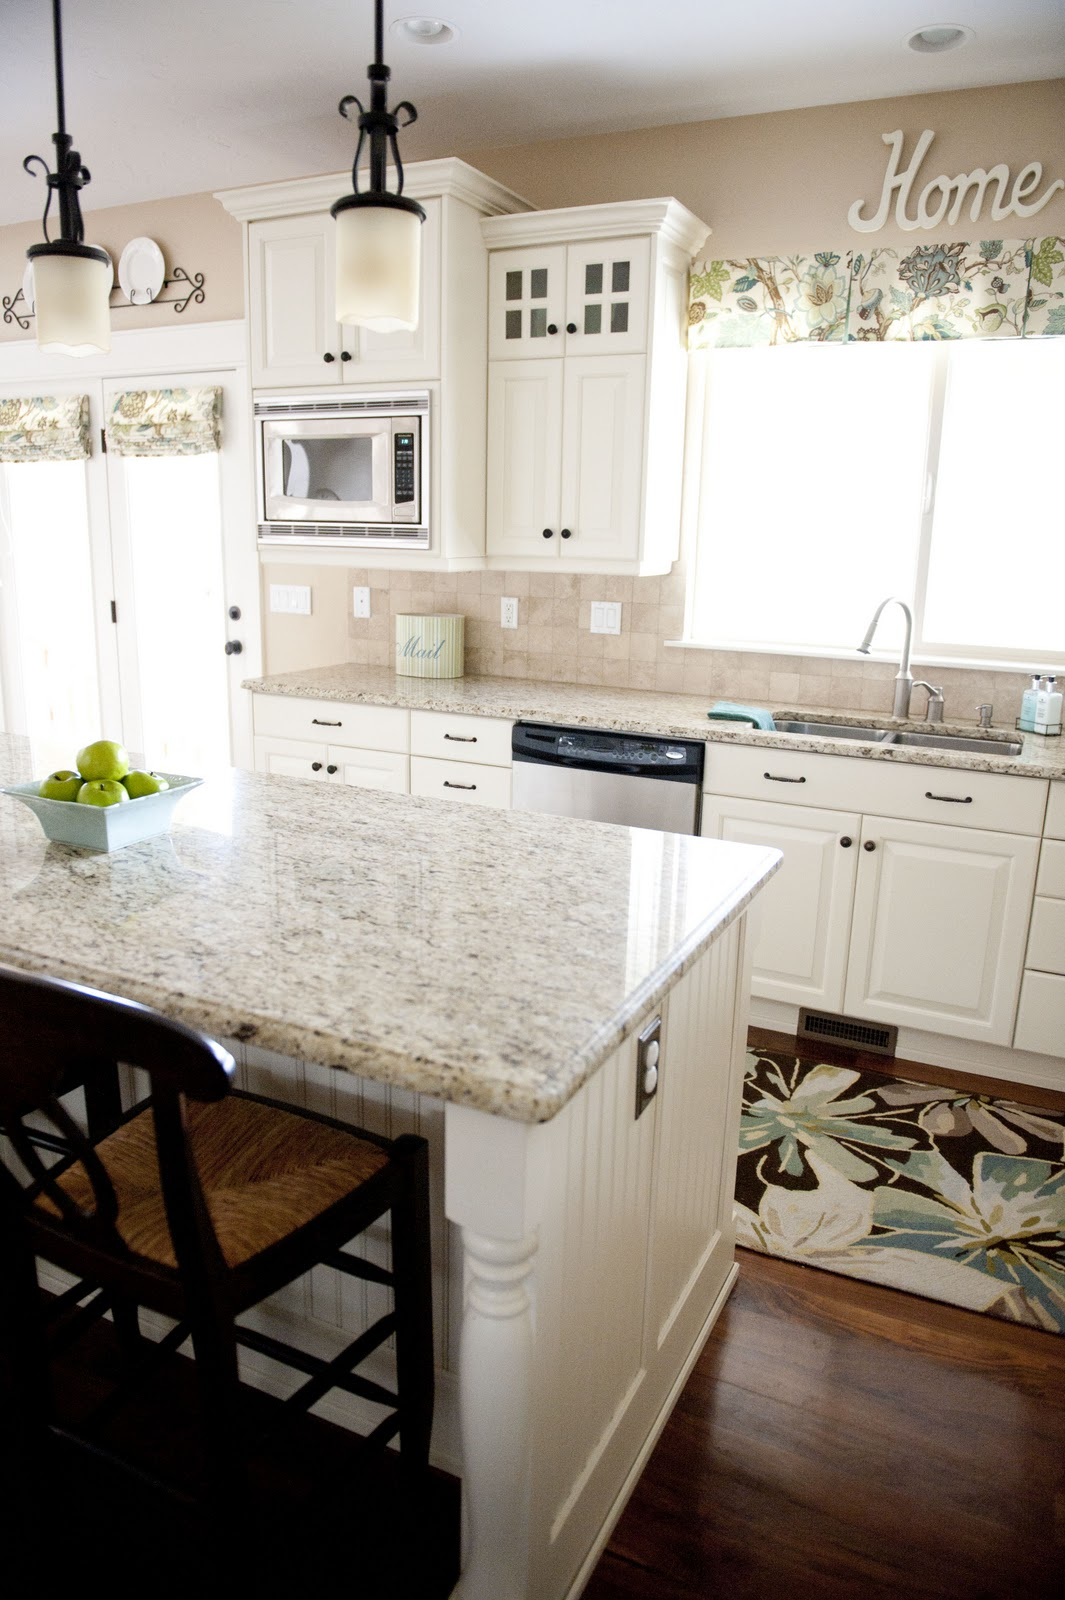 My Home Tour: Kitchen - Sita Montgomery Interiors